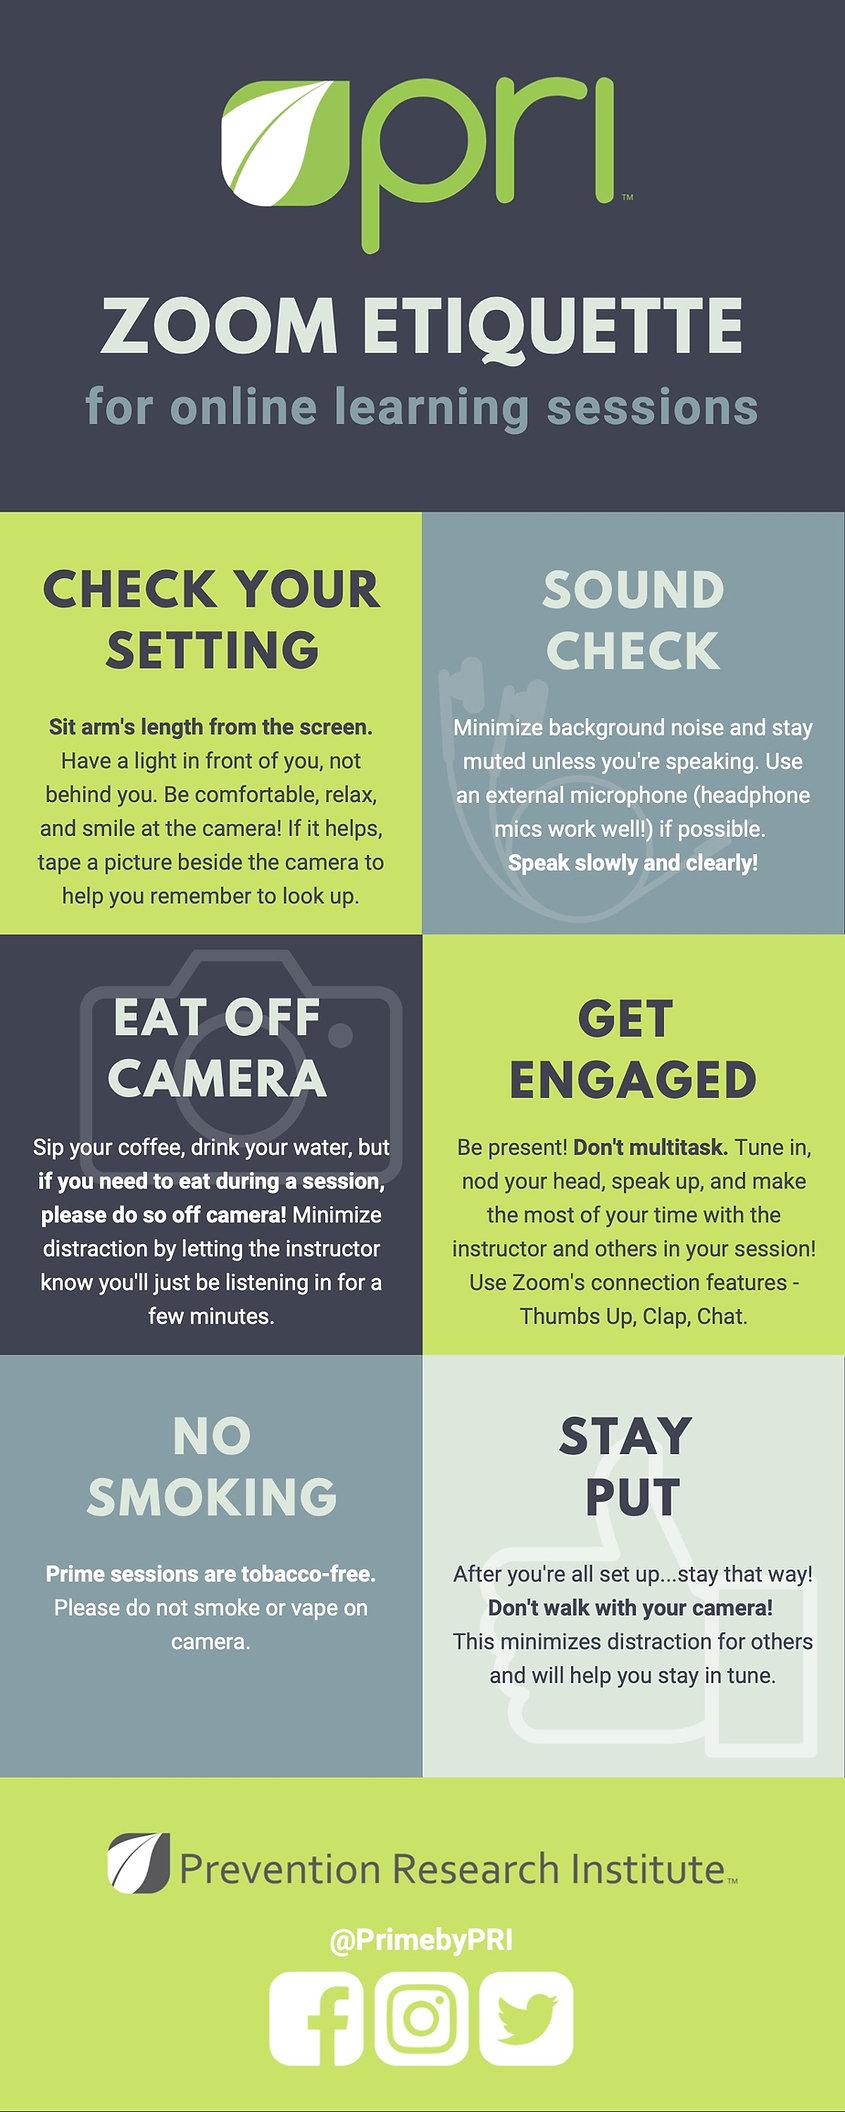 Zoom Etiquette Infographic.jpg